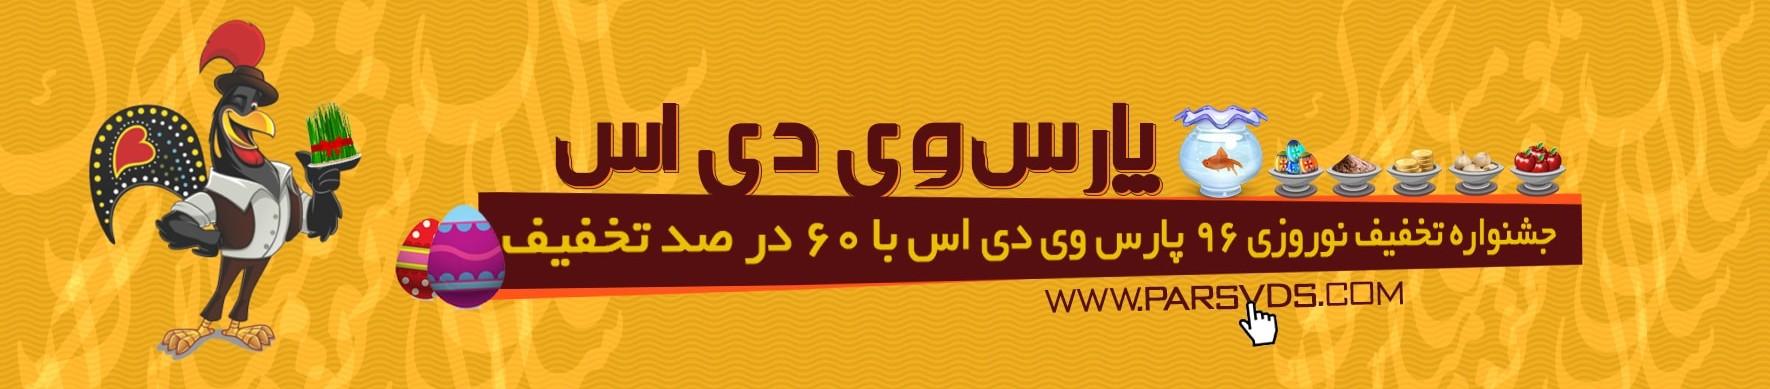 parsvds-Nowruz96